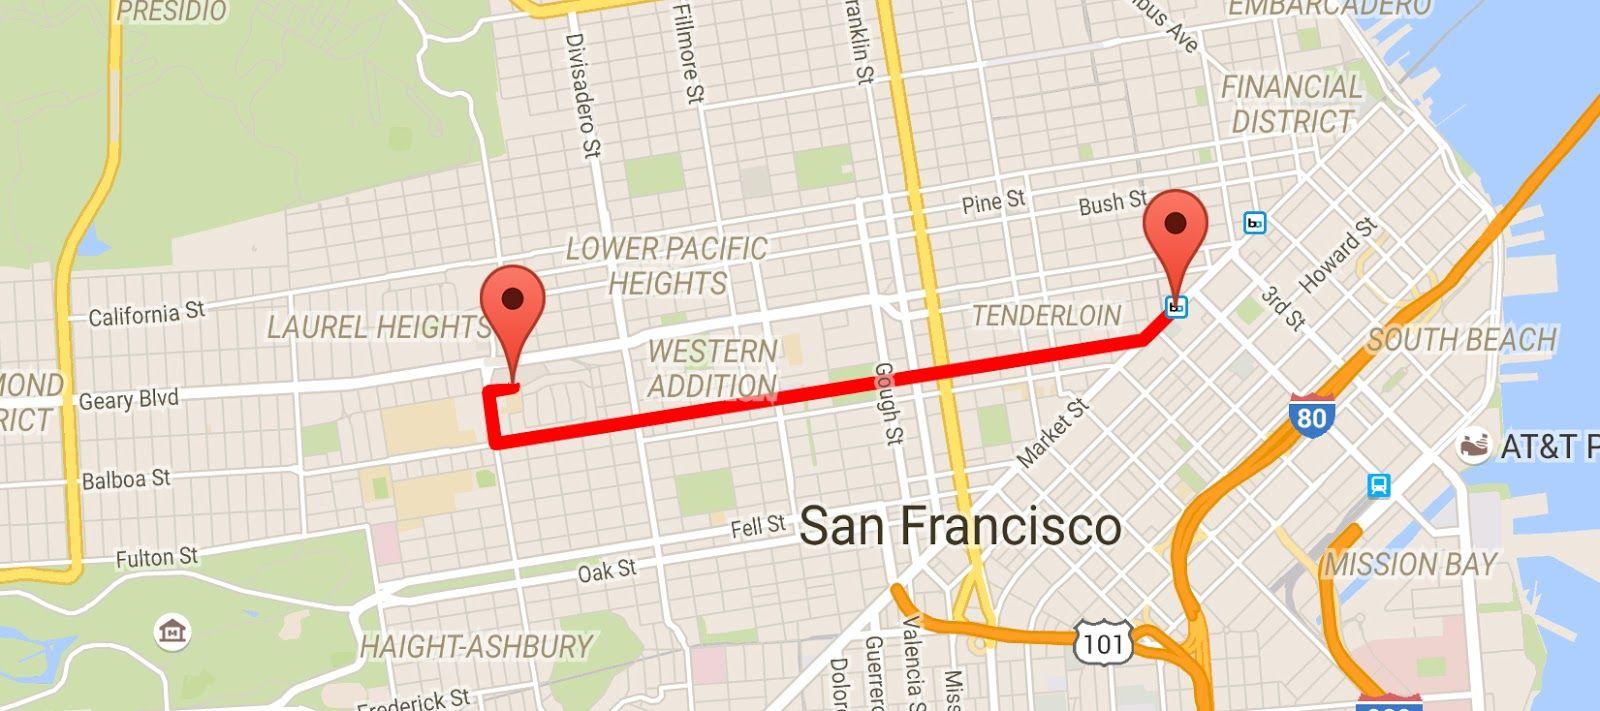 [Android Code] ใช้งาน Google Maps Direction API ให้ง่ายๆ